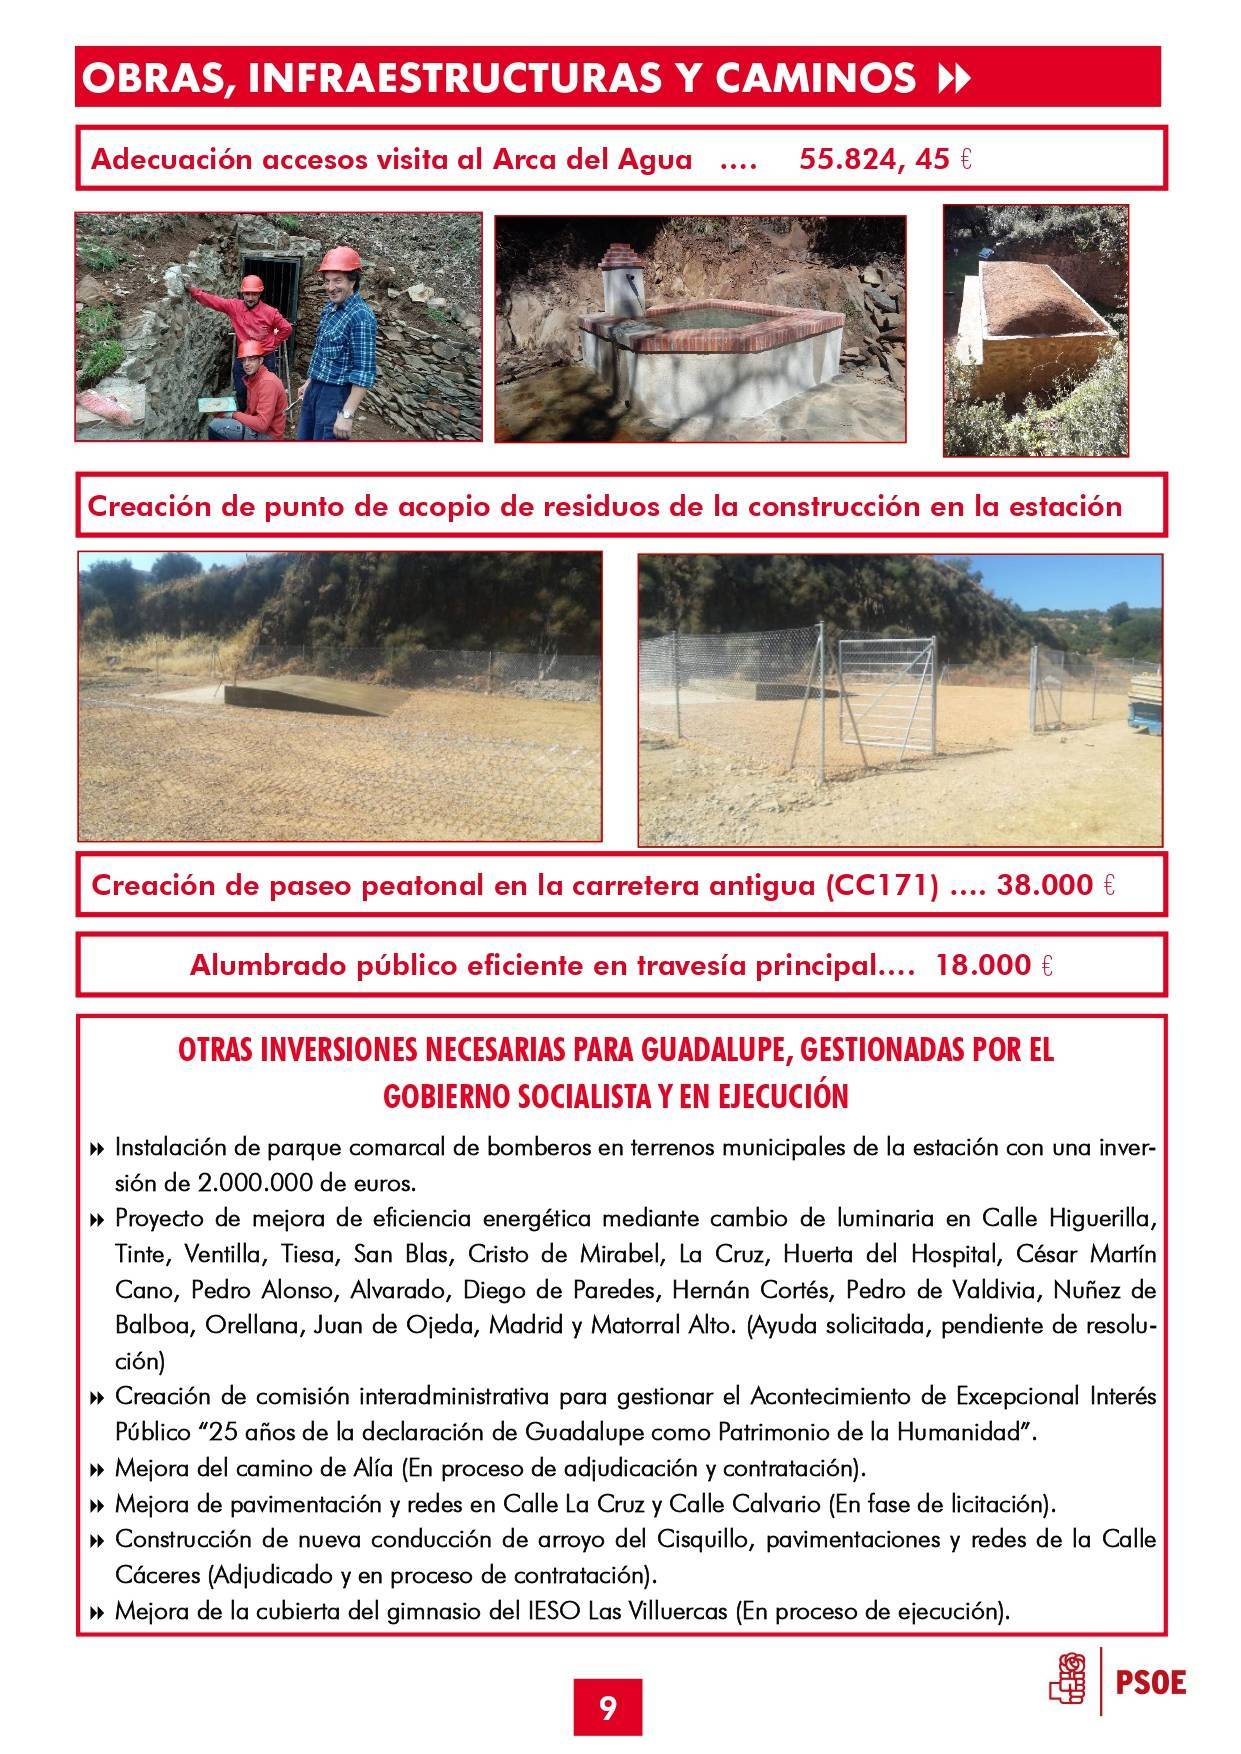 Boletín informativo de gestión municipal 2015-2019 - Guadalupe (Cáceres) 9